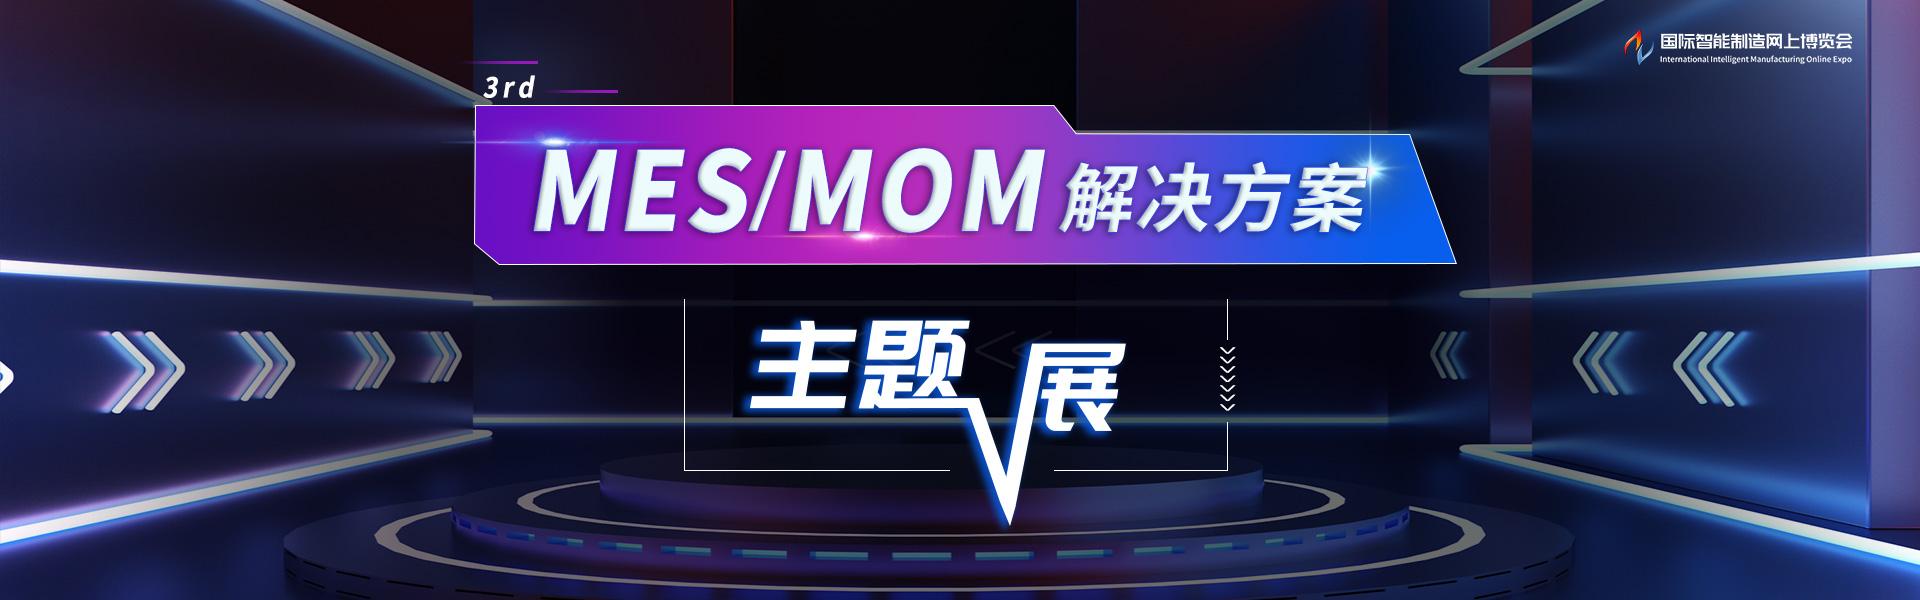 MES/MOM解决方案主题展